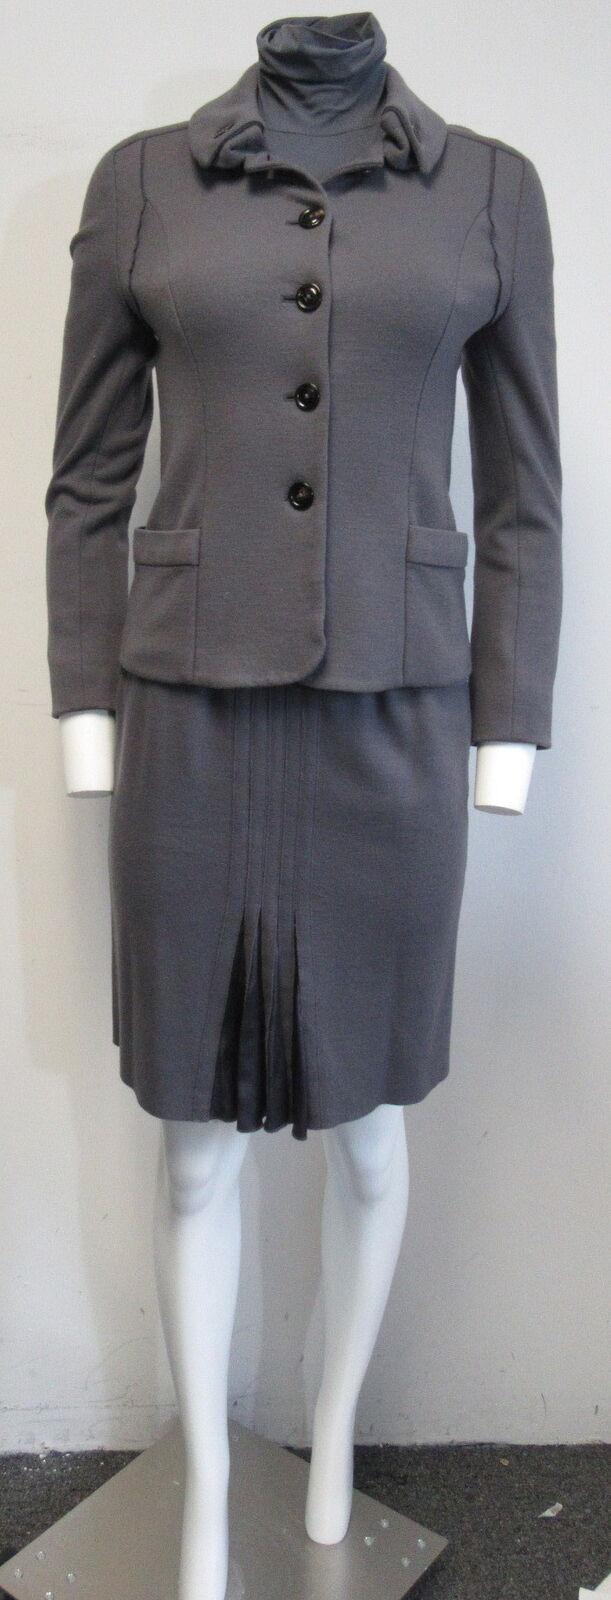 MARCCAIN purple wool cashmere 3 PC skirt suit SZ N1-N2 US  2-4 STUNNING